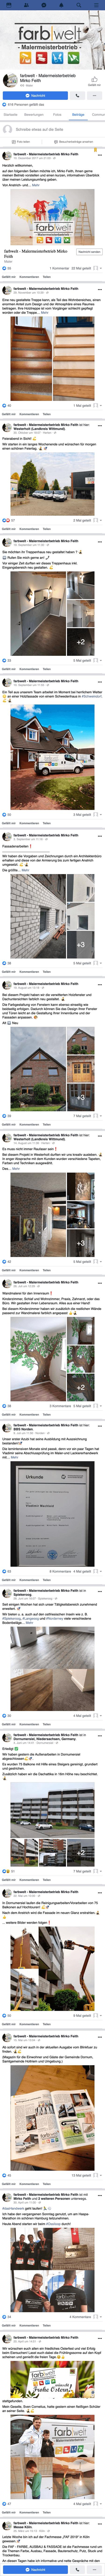 Farbwelt Feith | Farbwelt Facebook-Seite